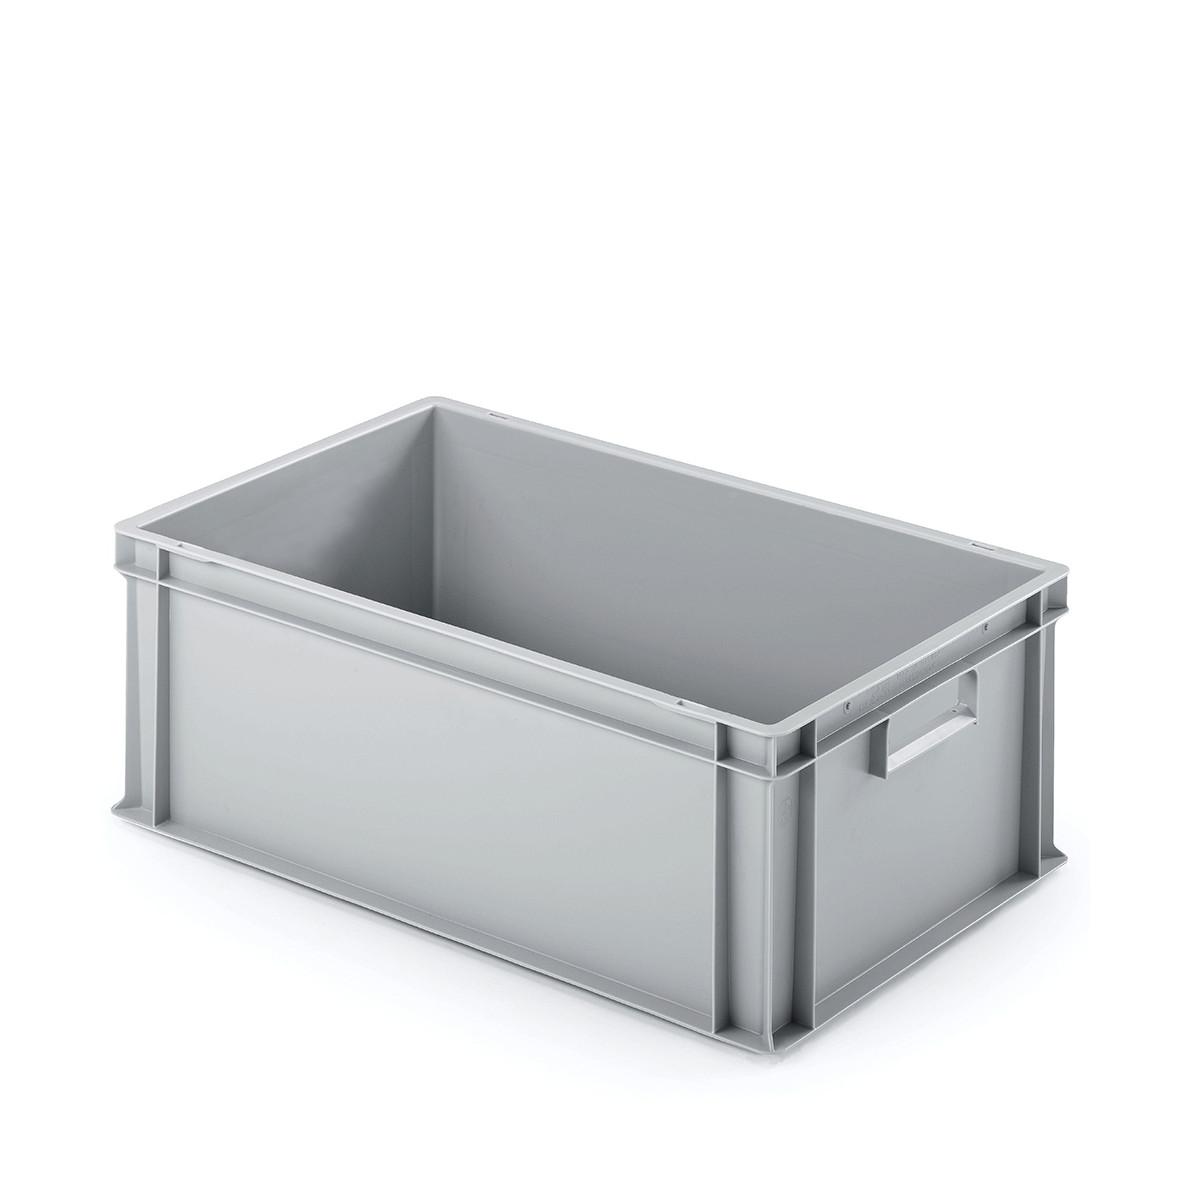 unista lagerboxen 60 x 40 x 22 cm schattec technischer. Black Bedroom Furniture Sets. Home Design Ideas